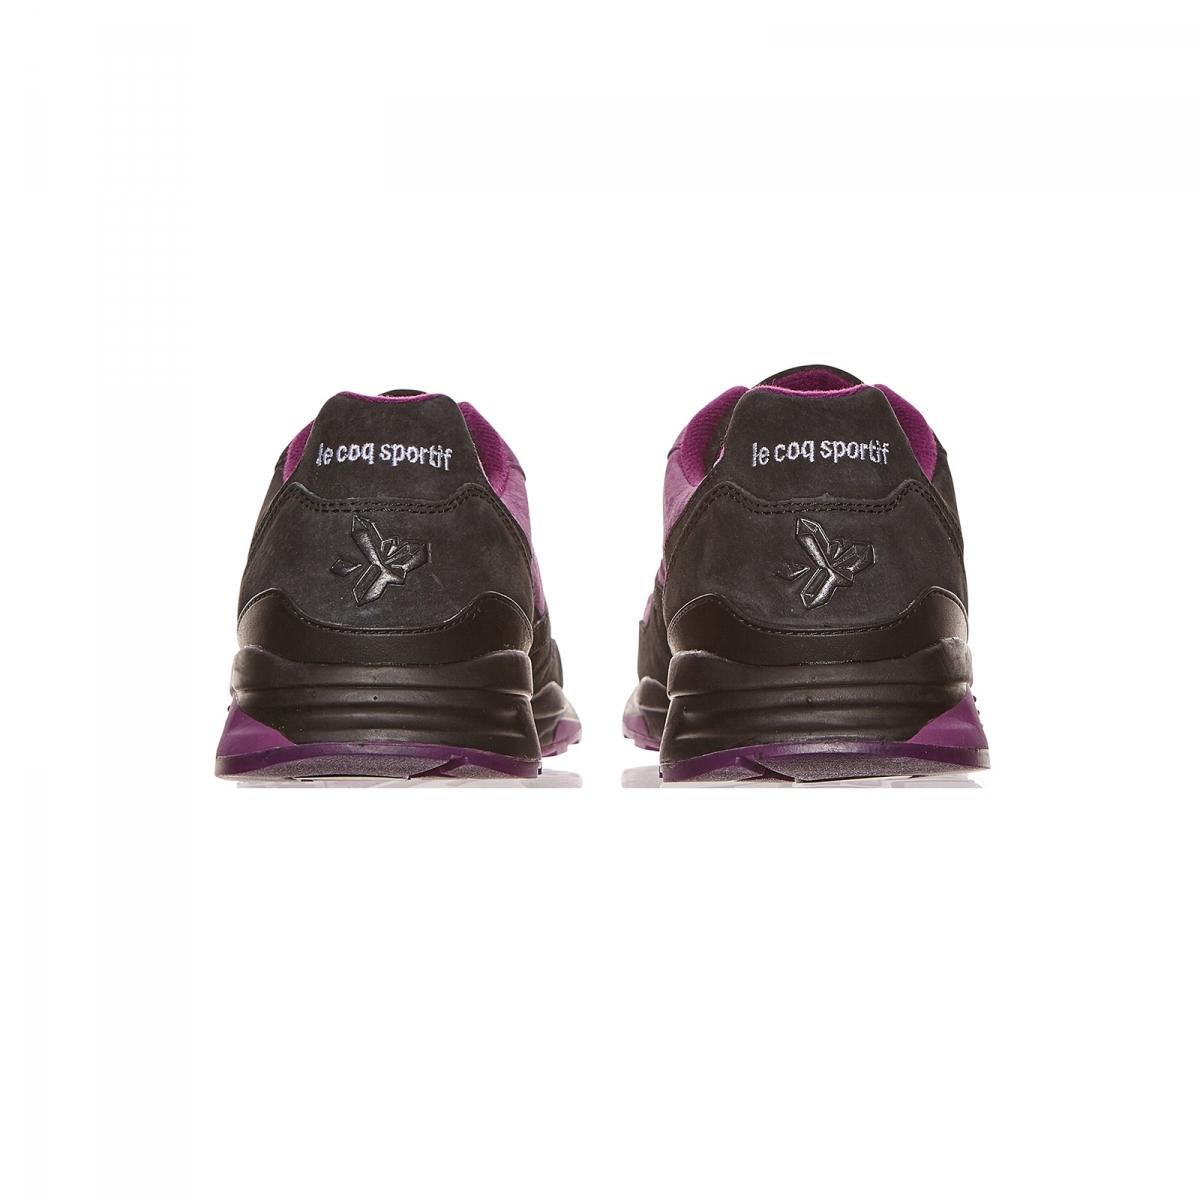 Le Coq Sportif Lcs R800 Mineral Sneakers in Purple